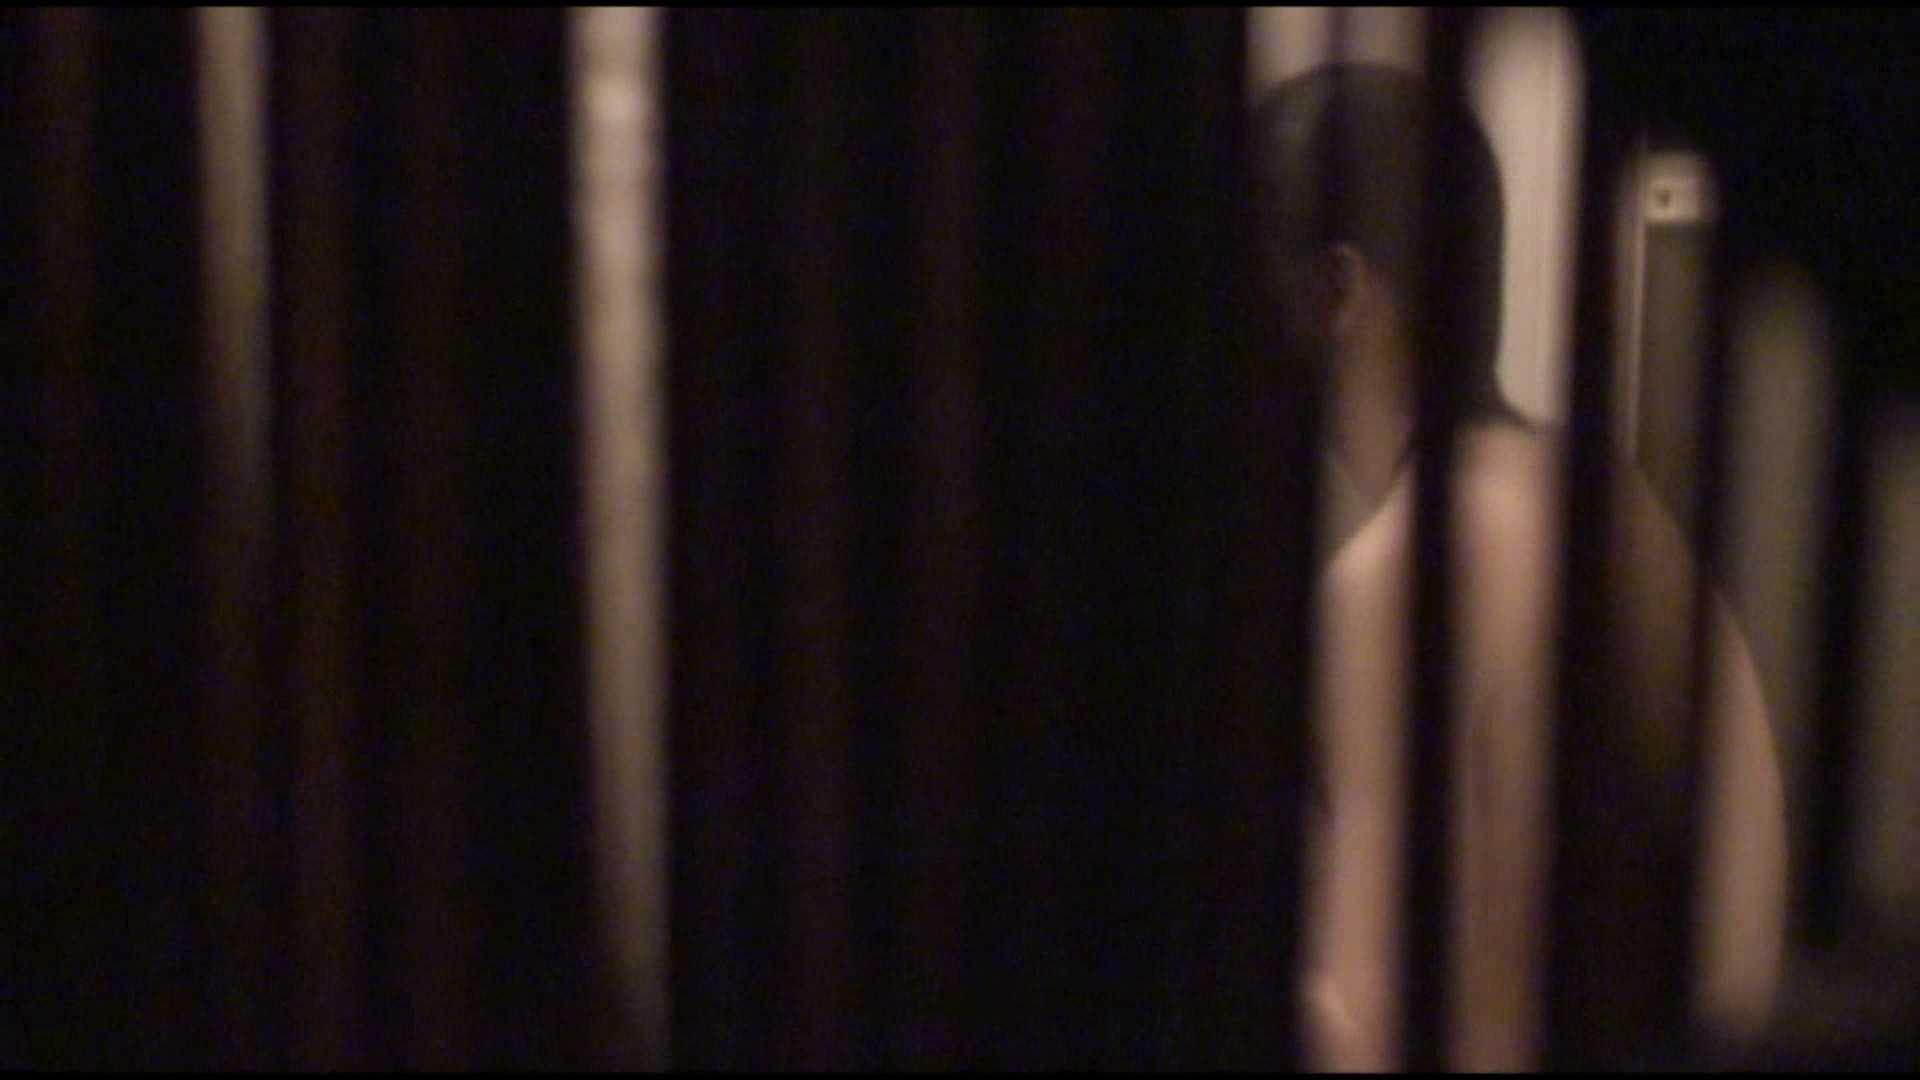 vol.05最高の極上美人!可愛い彼女の裸体をどうぞ!風呂上り鏡チェックも必見! 美人  99PIX 65